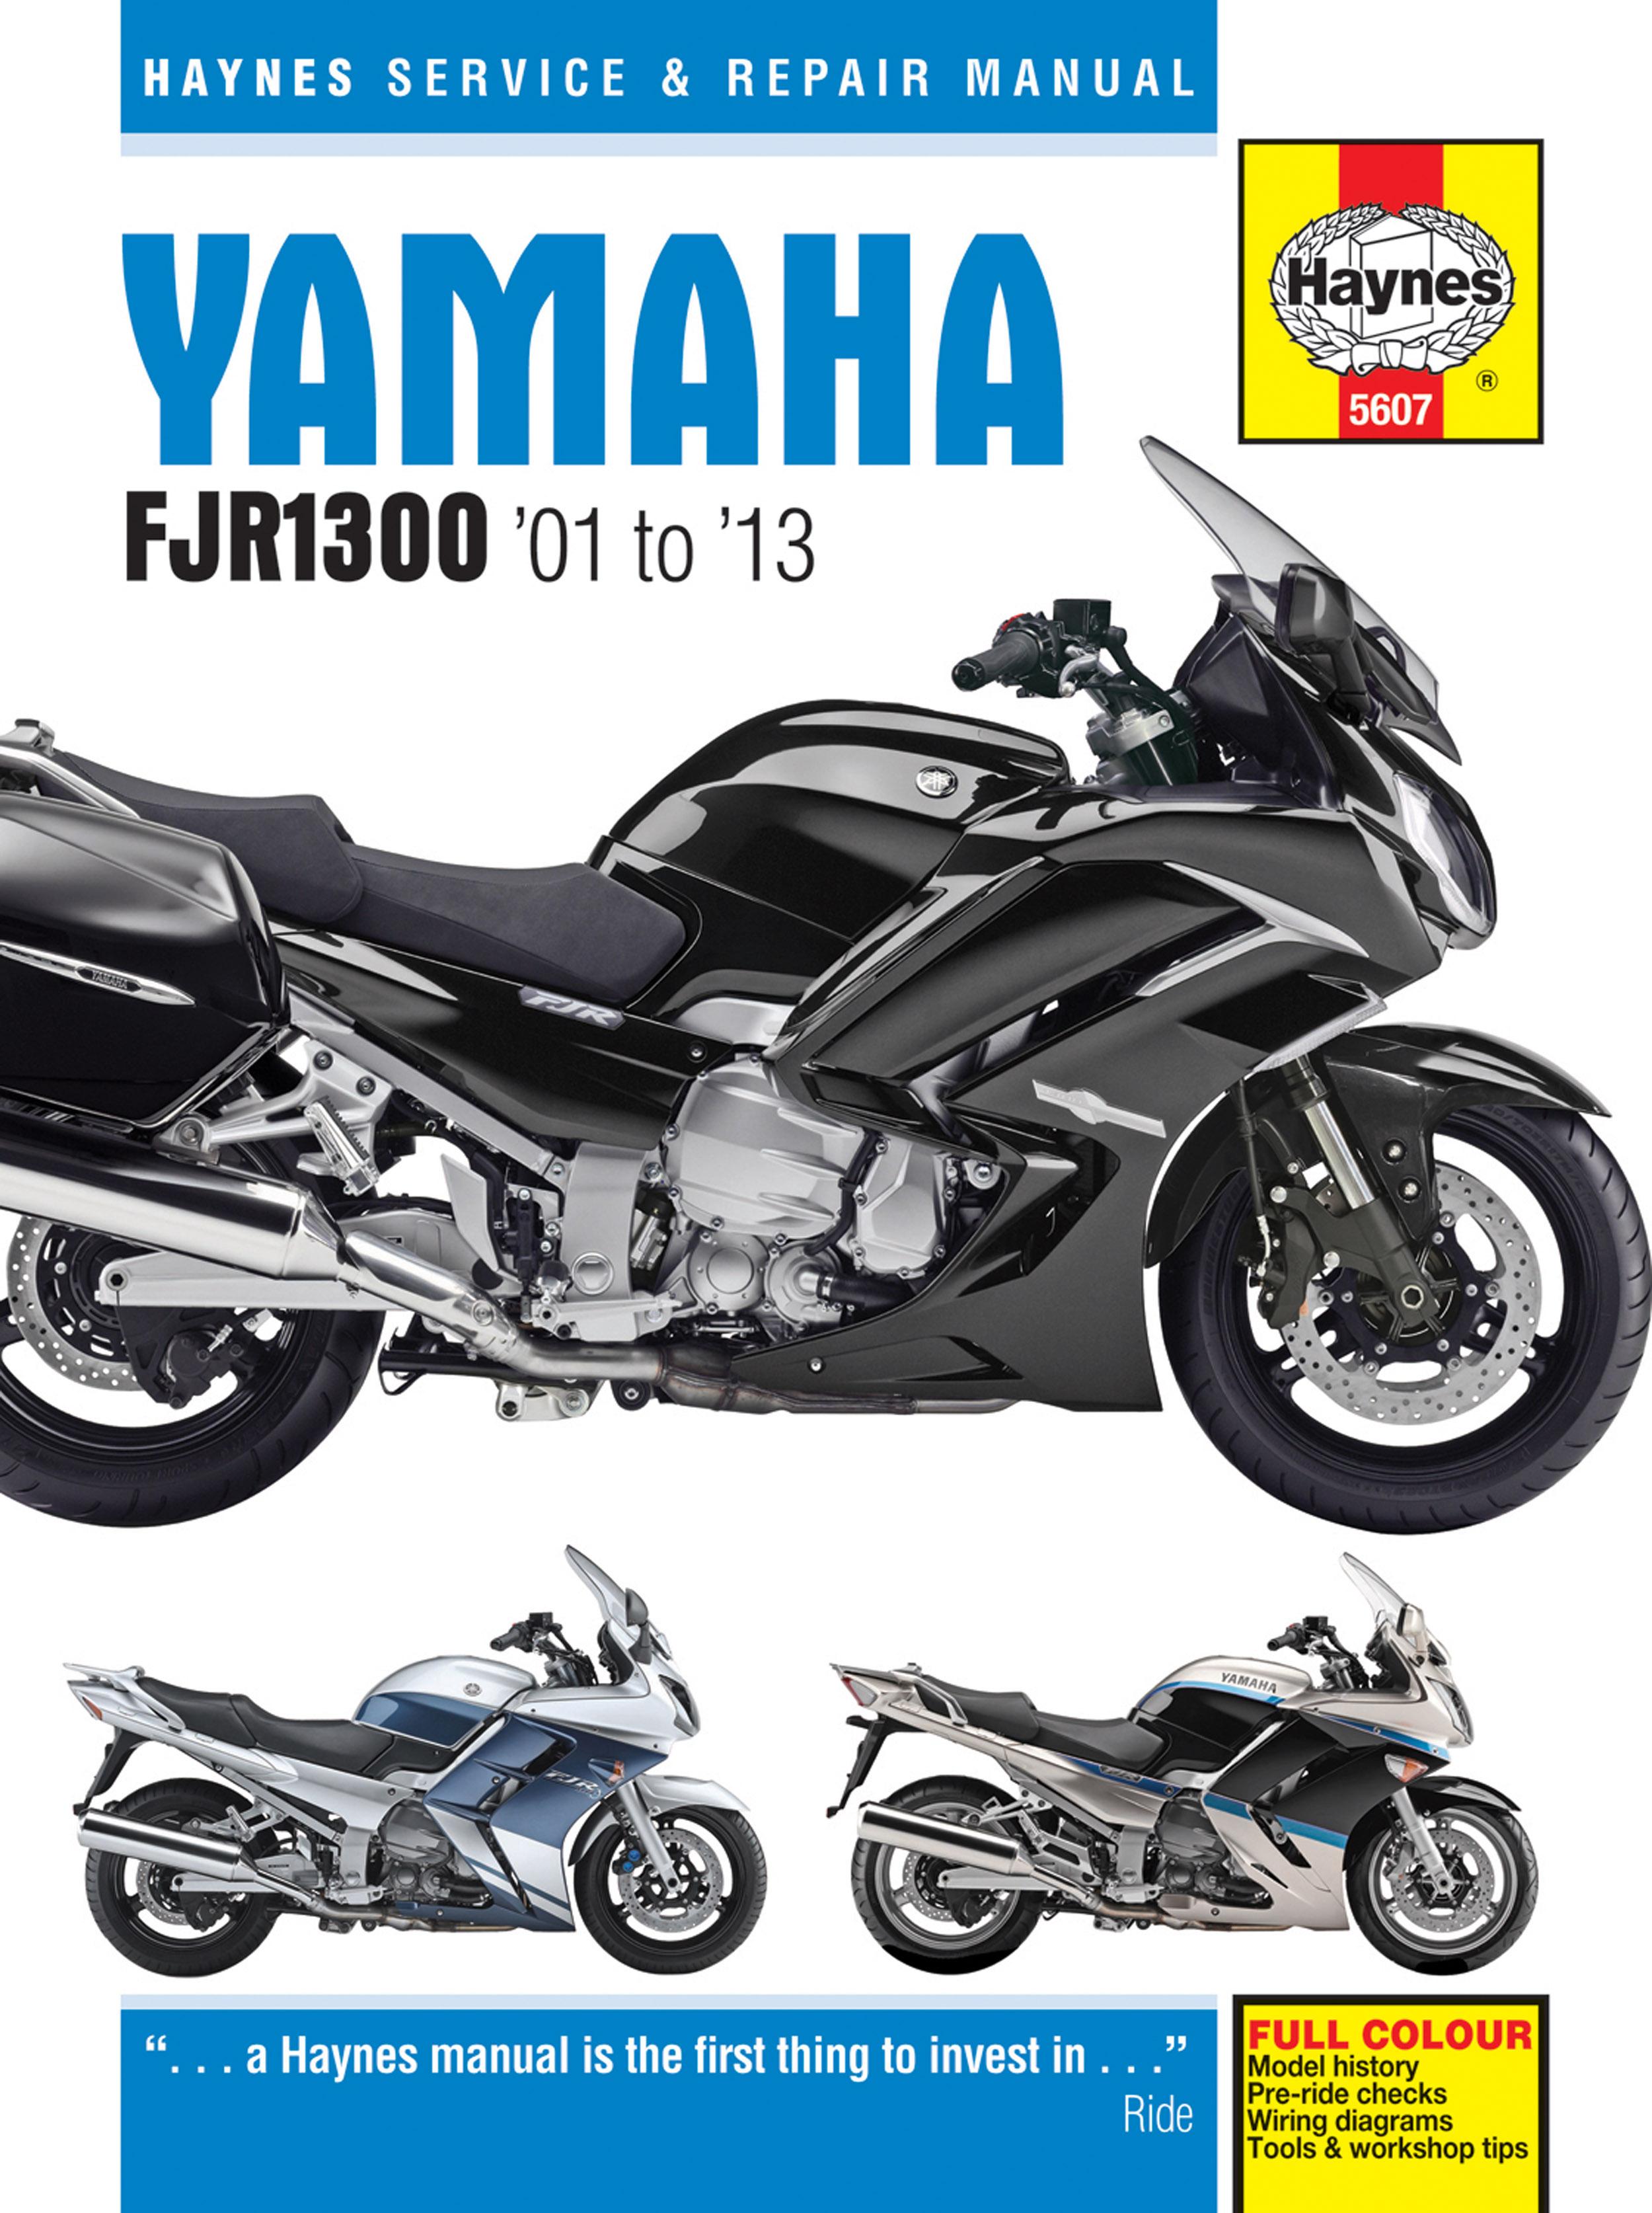 Haynes M5607 cover yamaha fjr1300 (01 13) haynes repair manual haynes manuals 2014 Yamaha FJR1300 at n-0.co